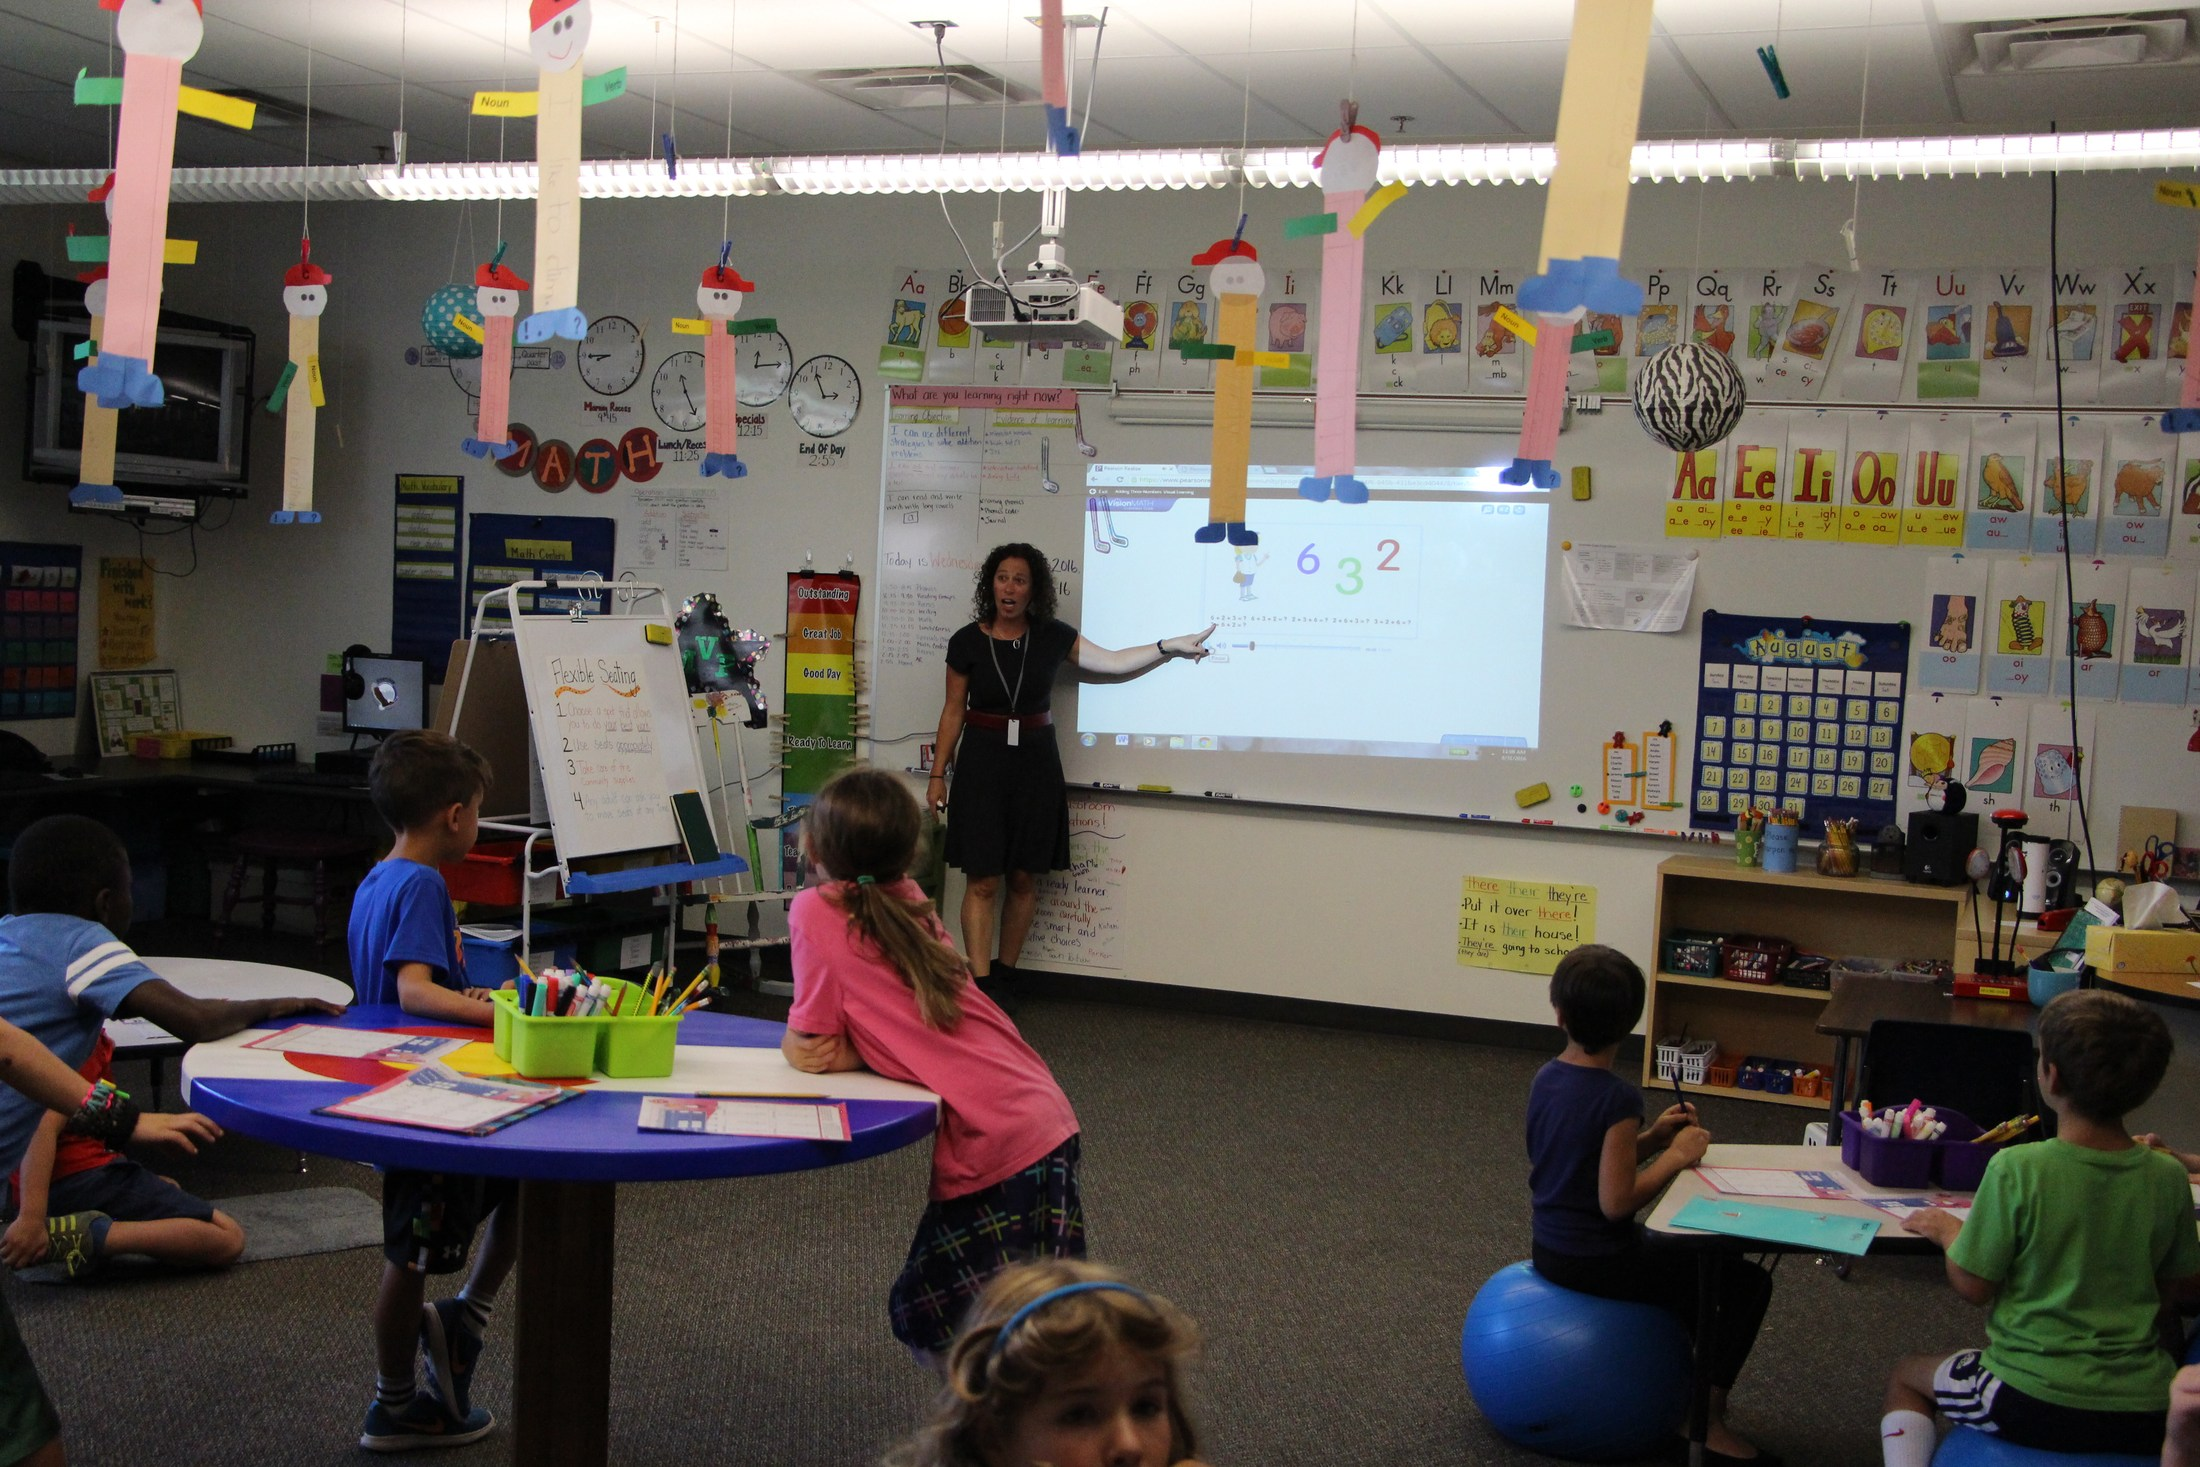 Teacher Corey Rosen uses a smart board in her class.